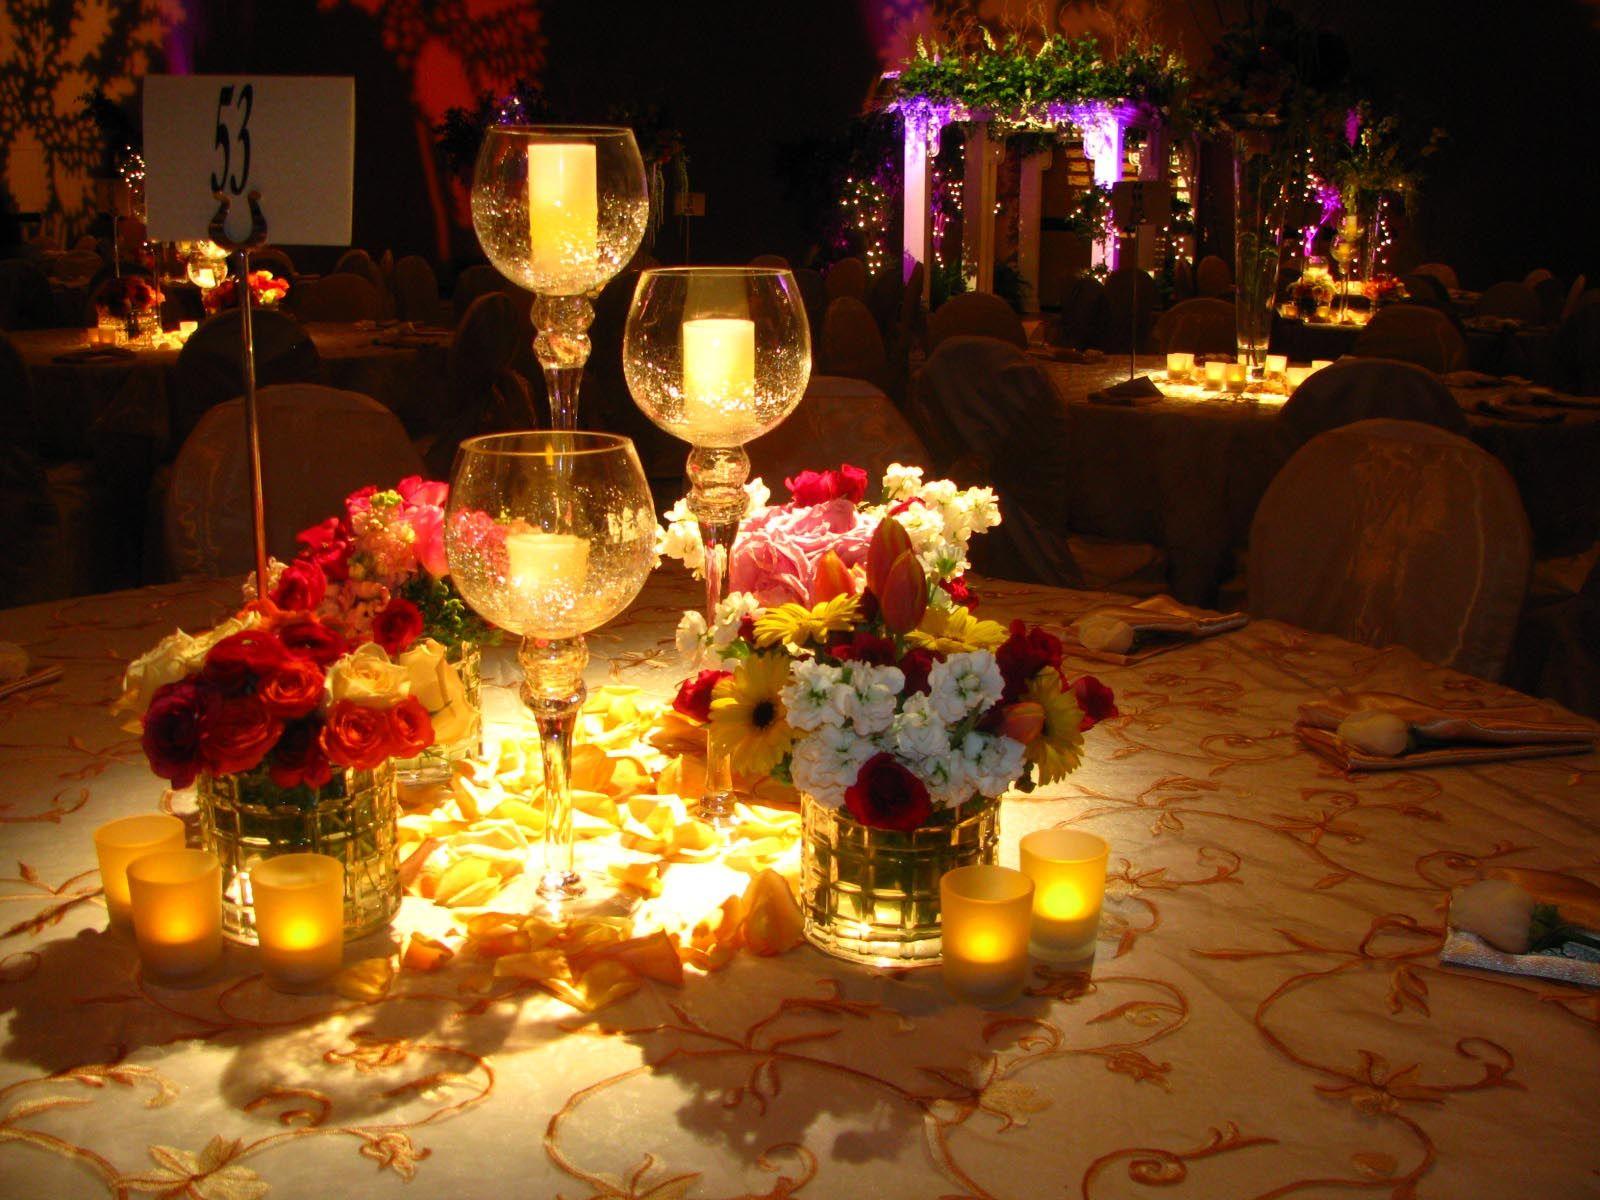 Romantic Candlelight Dinner | Romantic Candle Light Dinner ...